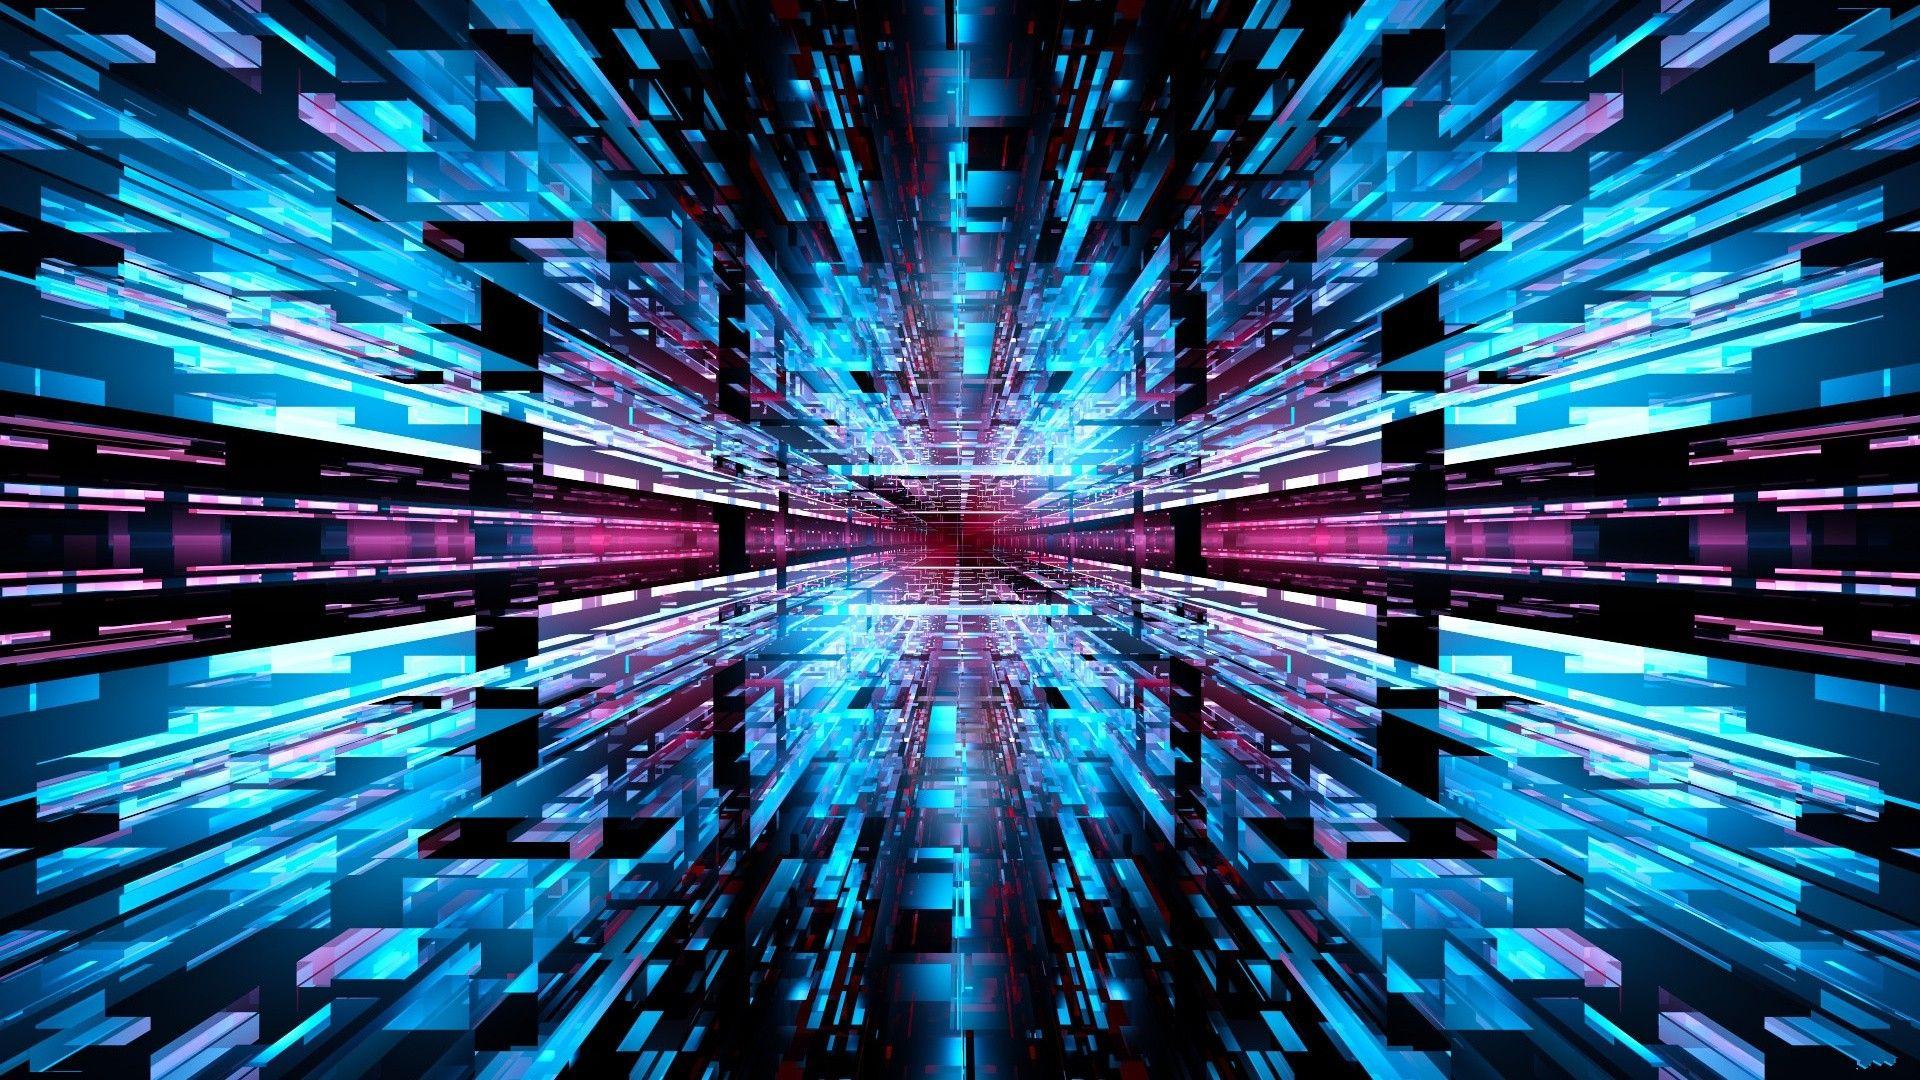 Digital Art Background background image